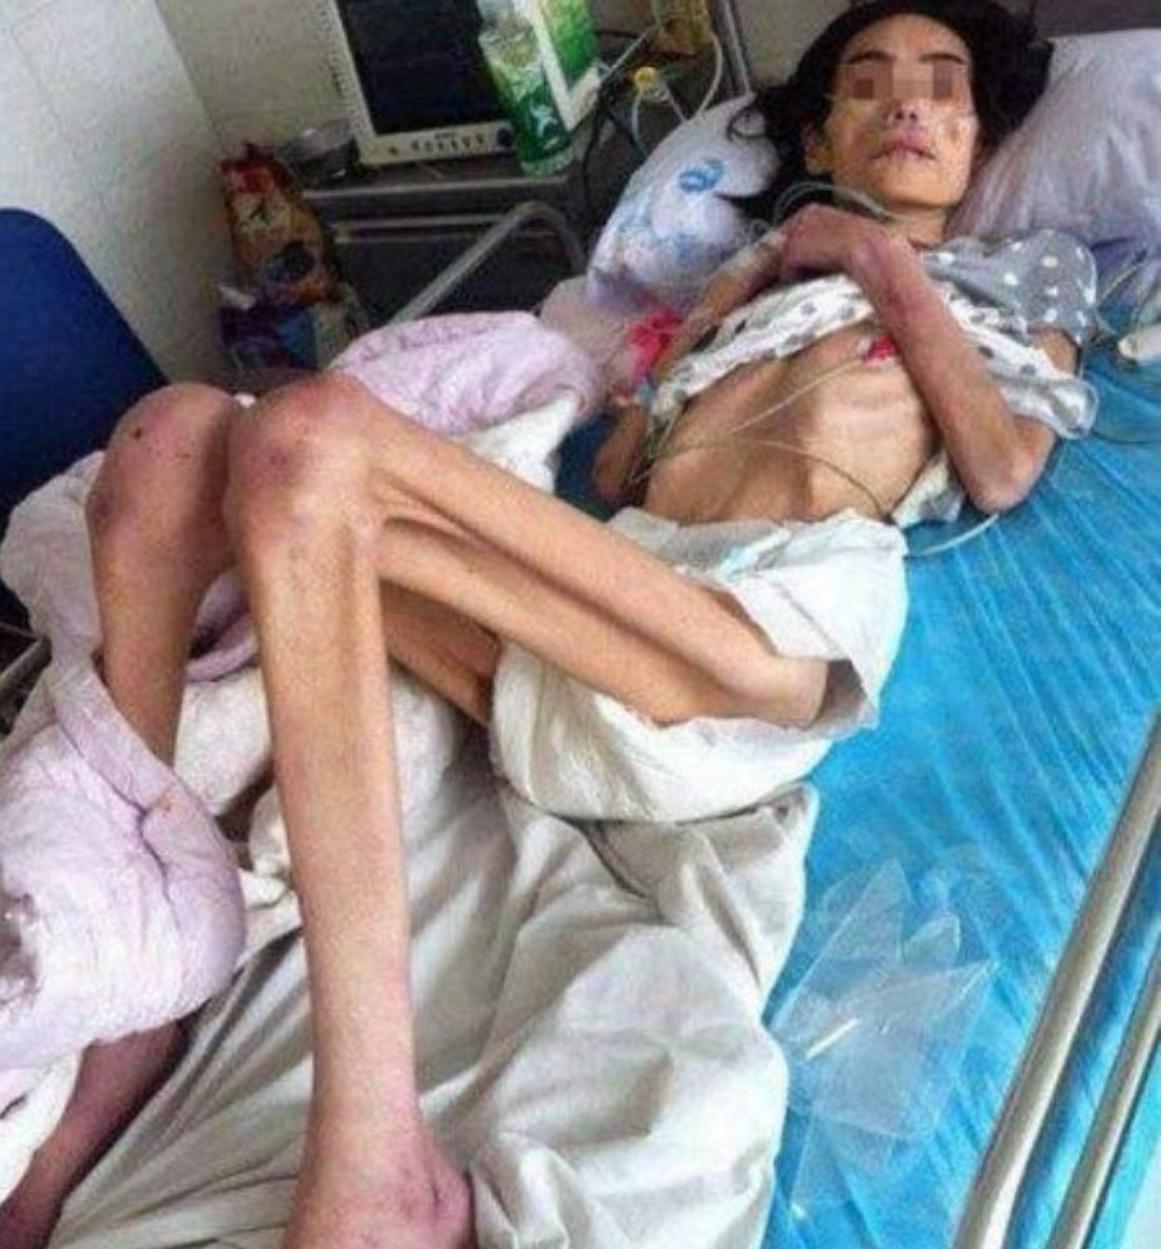 ec9584eb82b4 5 - 시어머니의 학대로 체중 '18kg'의 반신불수가 된 여성...'경악'